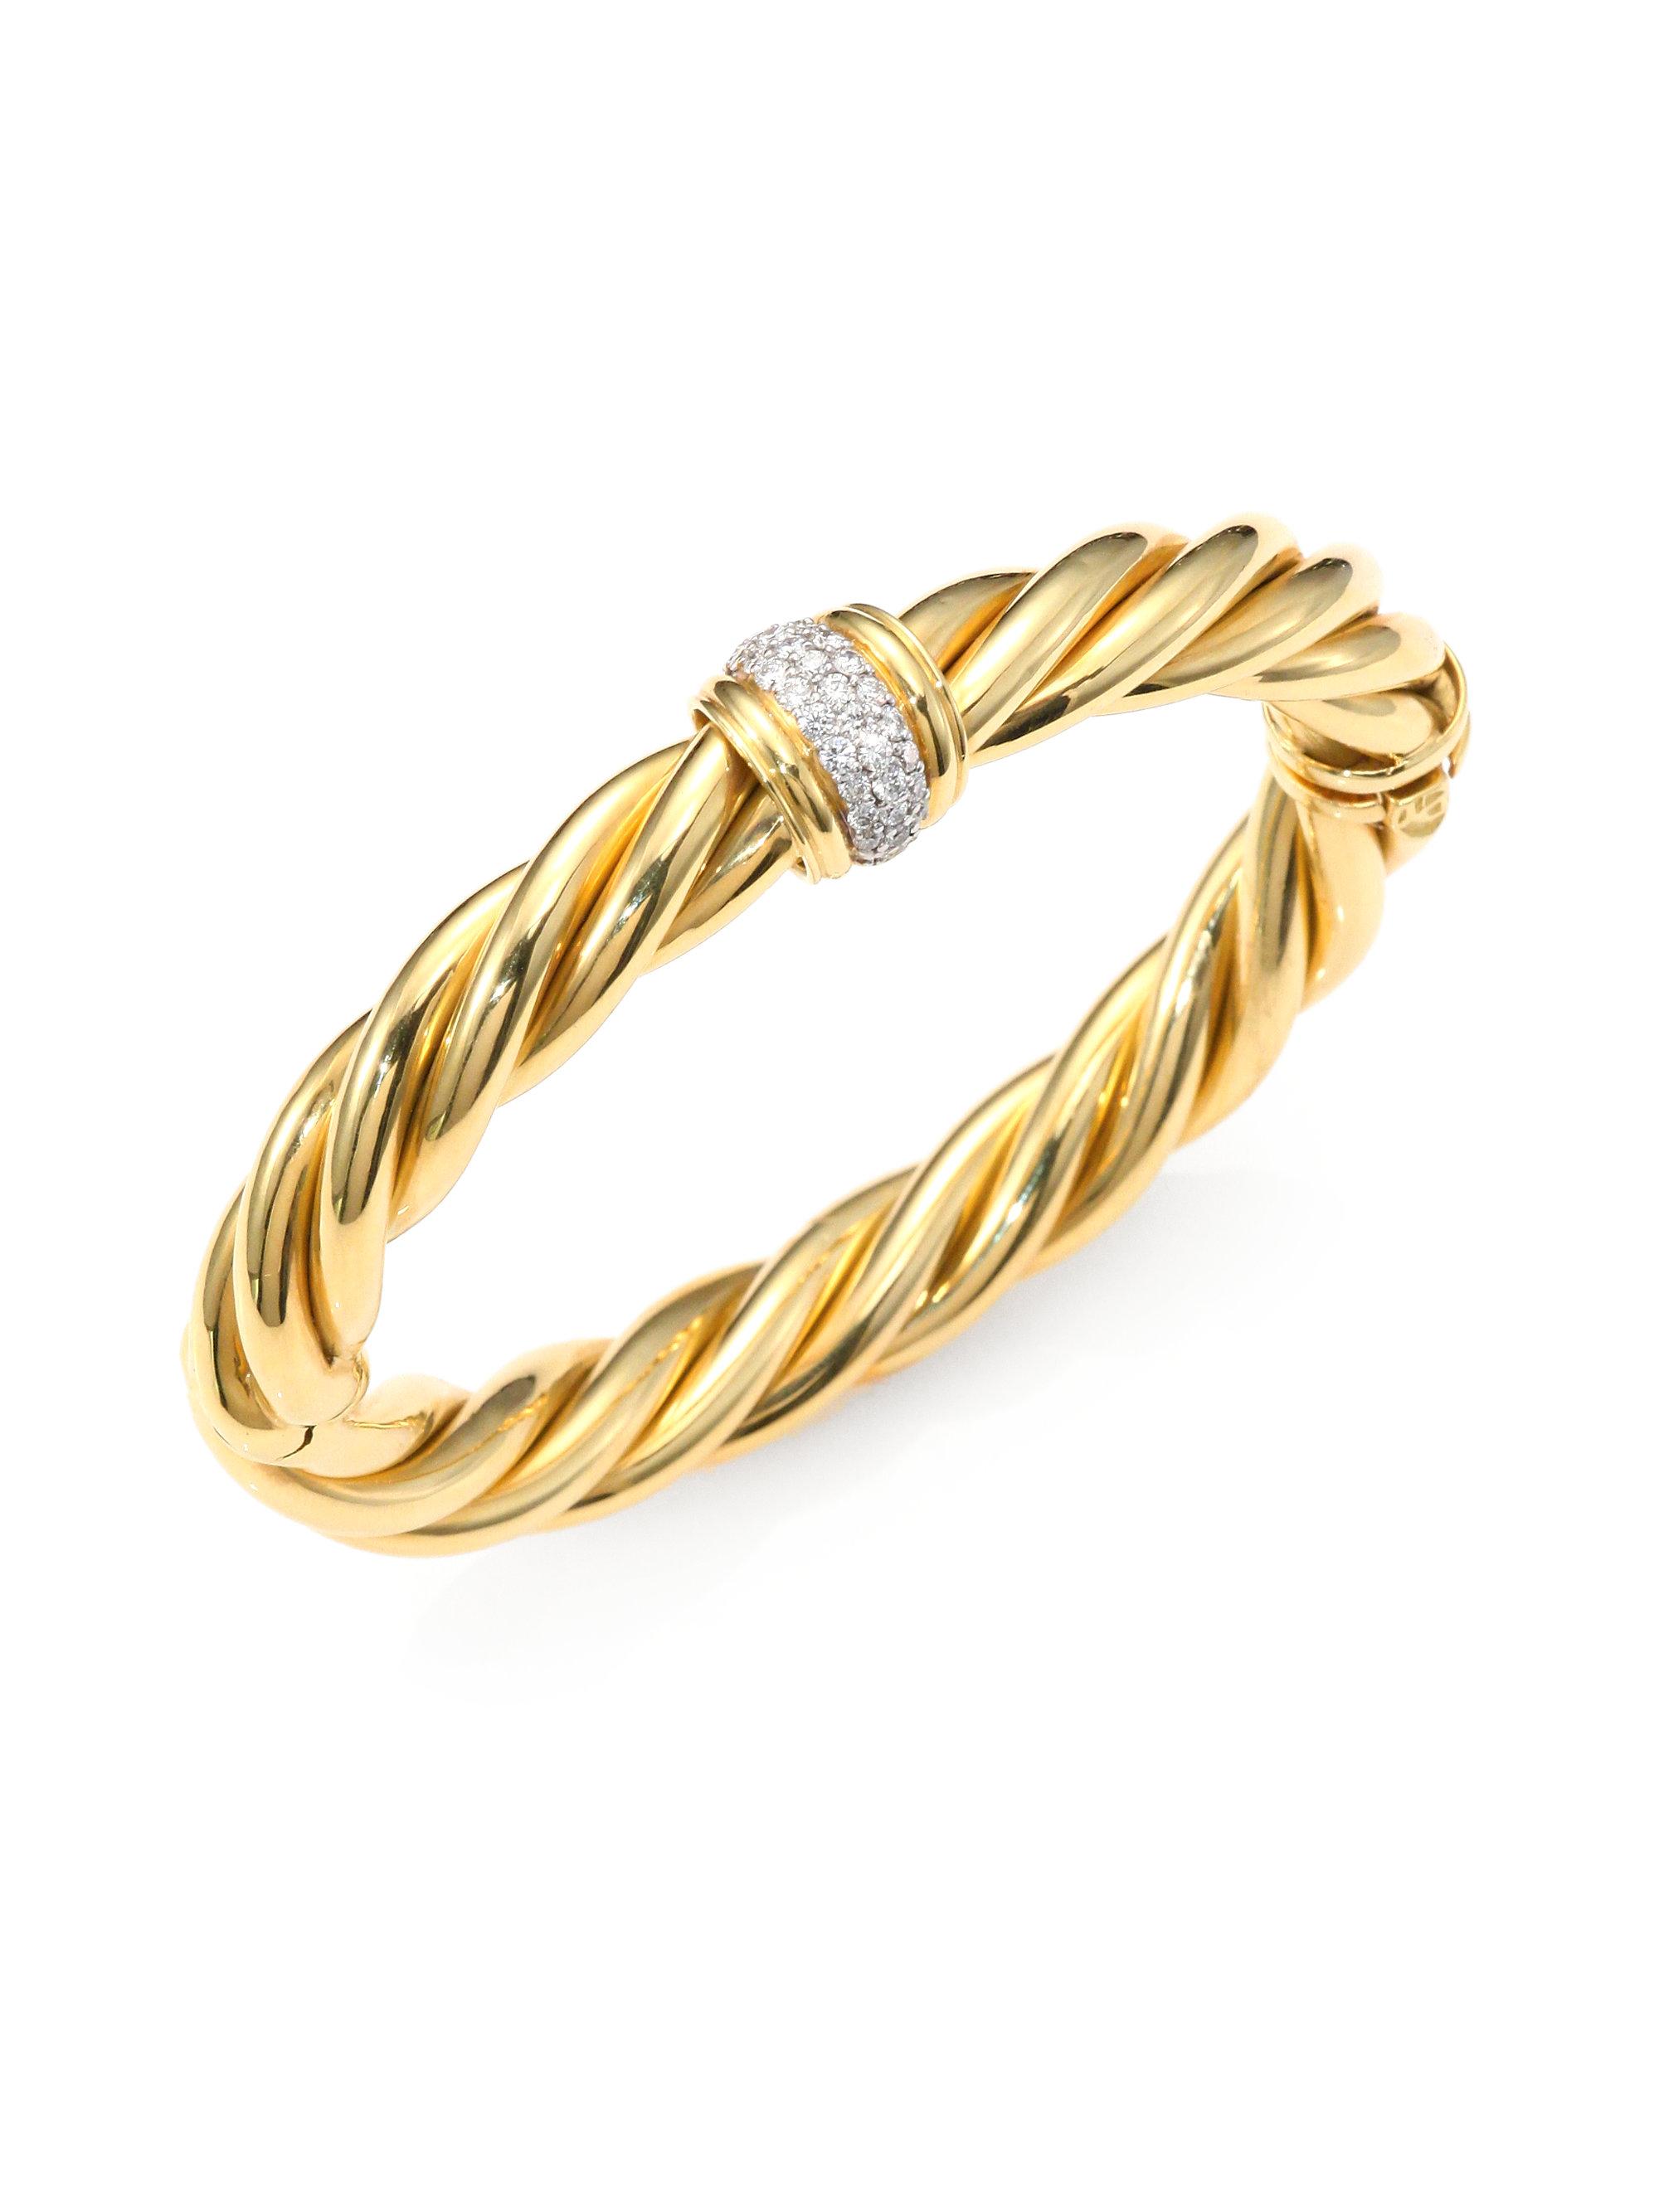 David Yurman Diamond 18k Gold Cable Cuff Bracelet In Gold